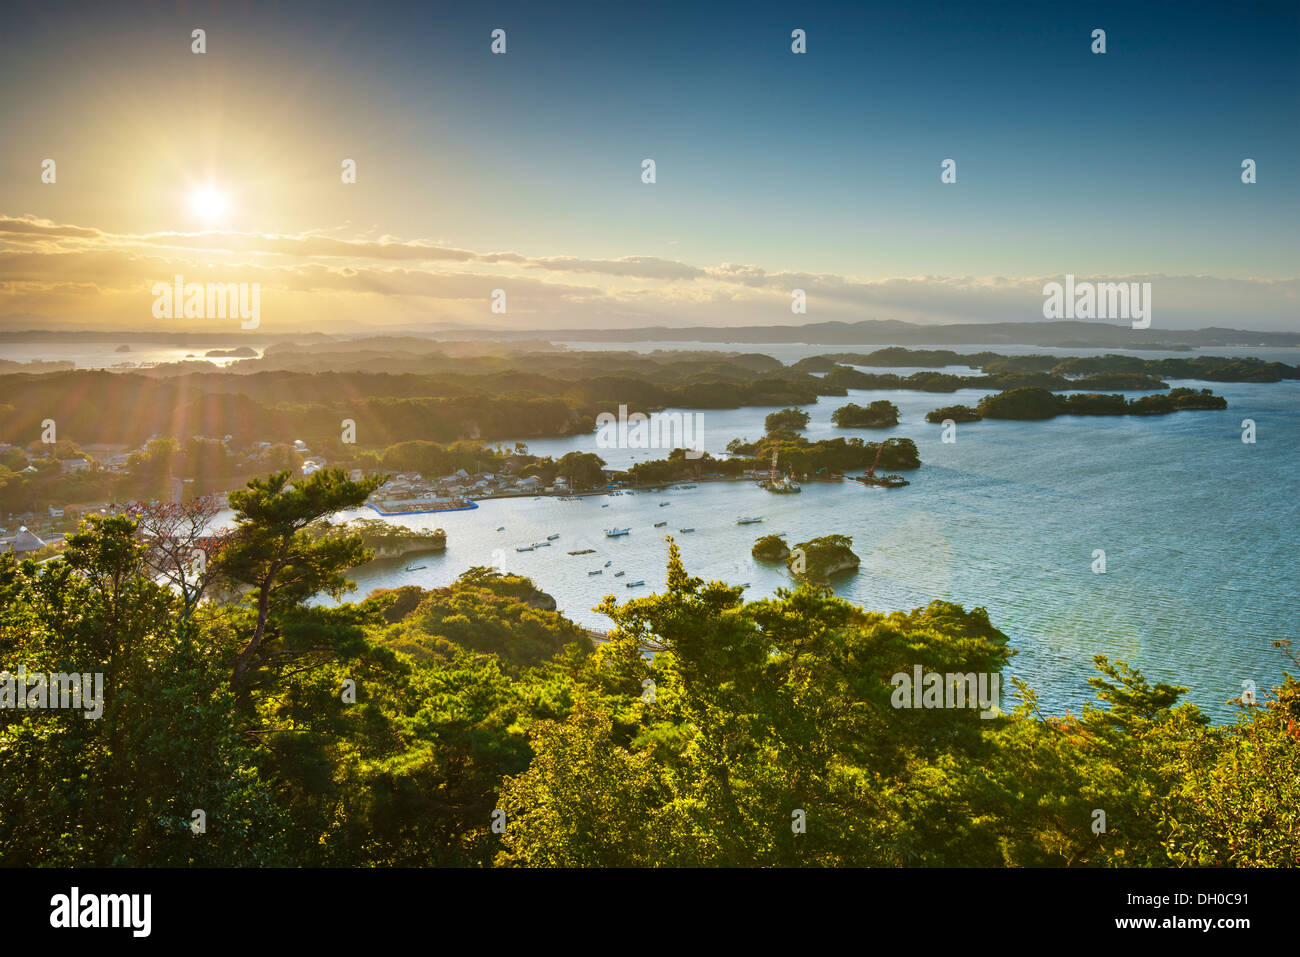 Küste von Matsushima, Japan. Stockbild